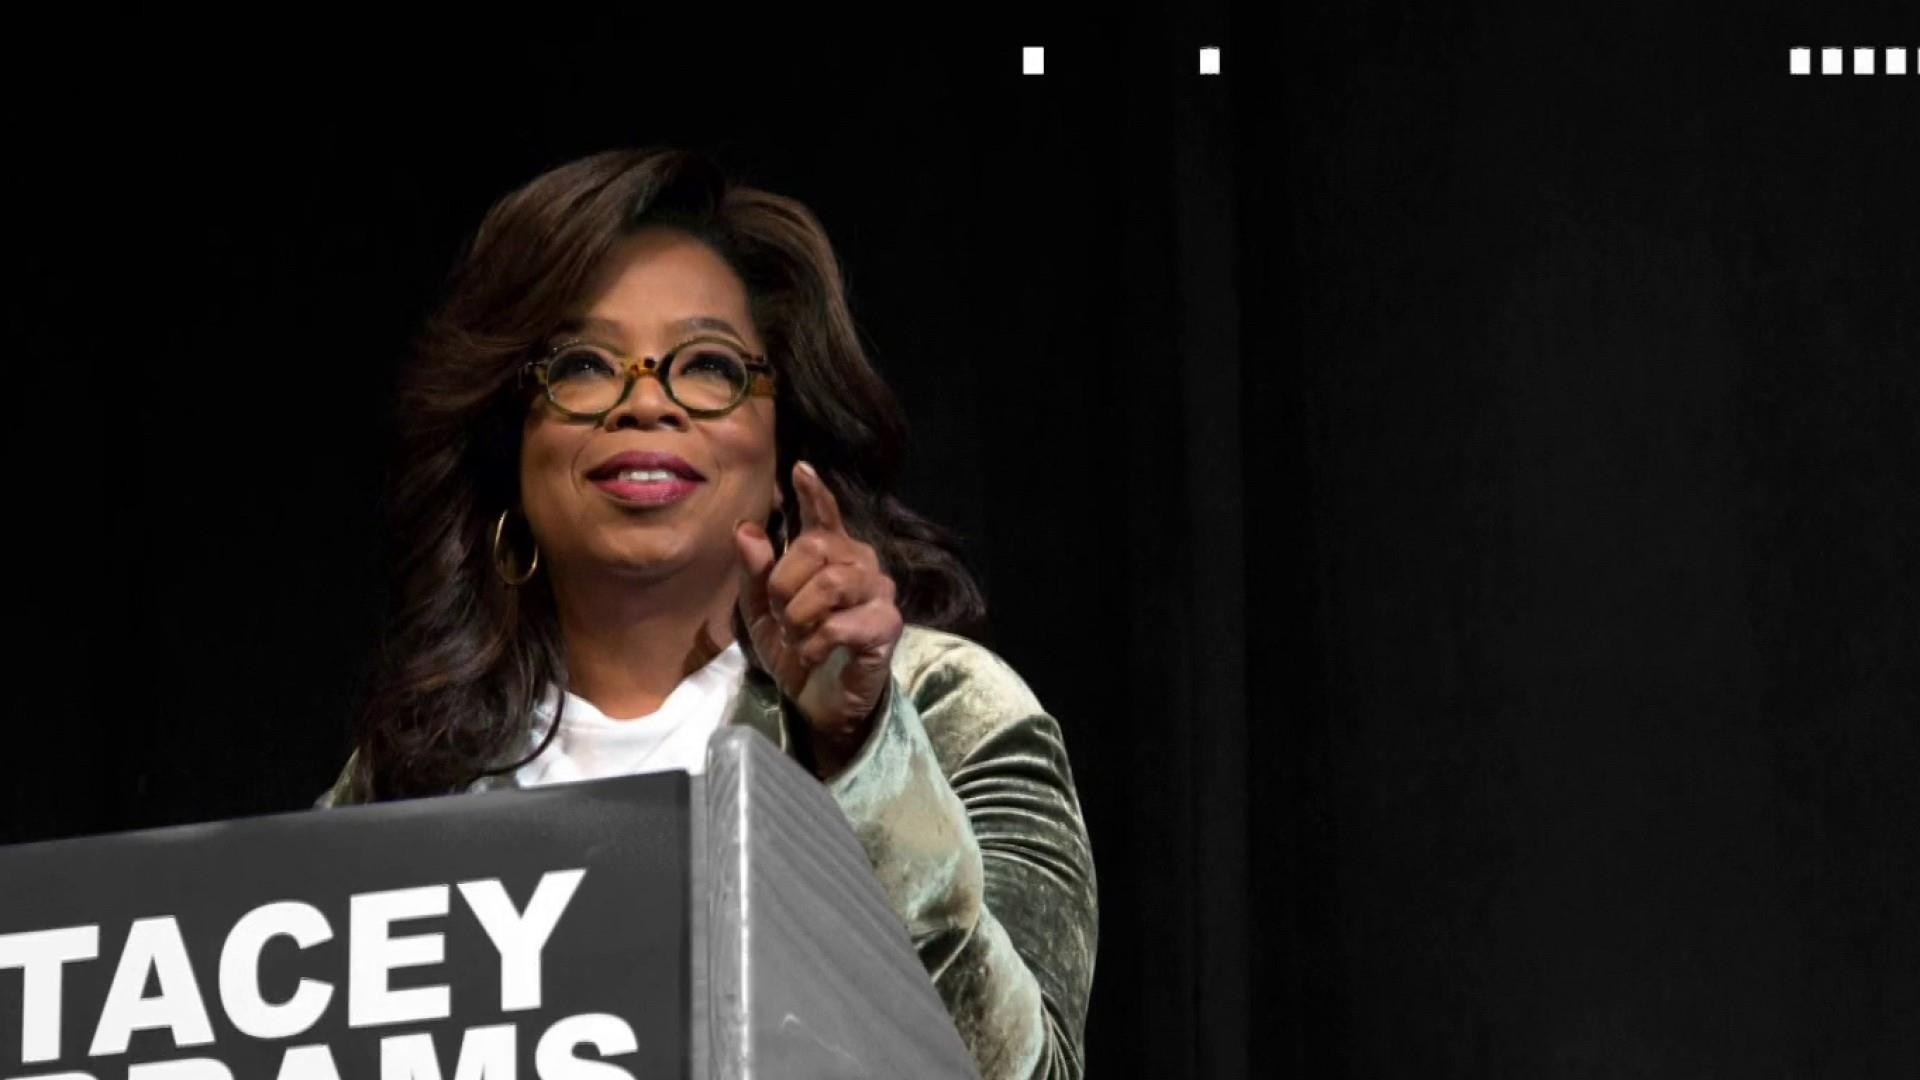 Oprah knocks on doors for Democrat Stacey Abrams in Georgia